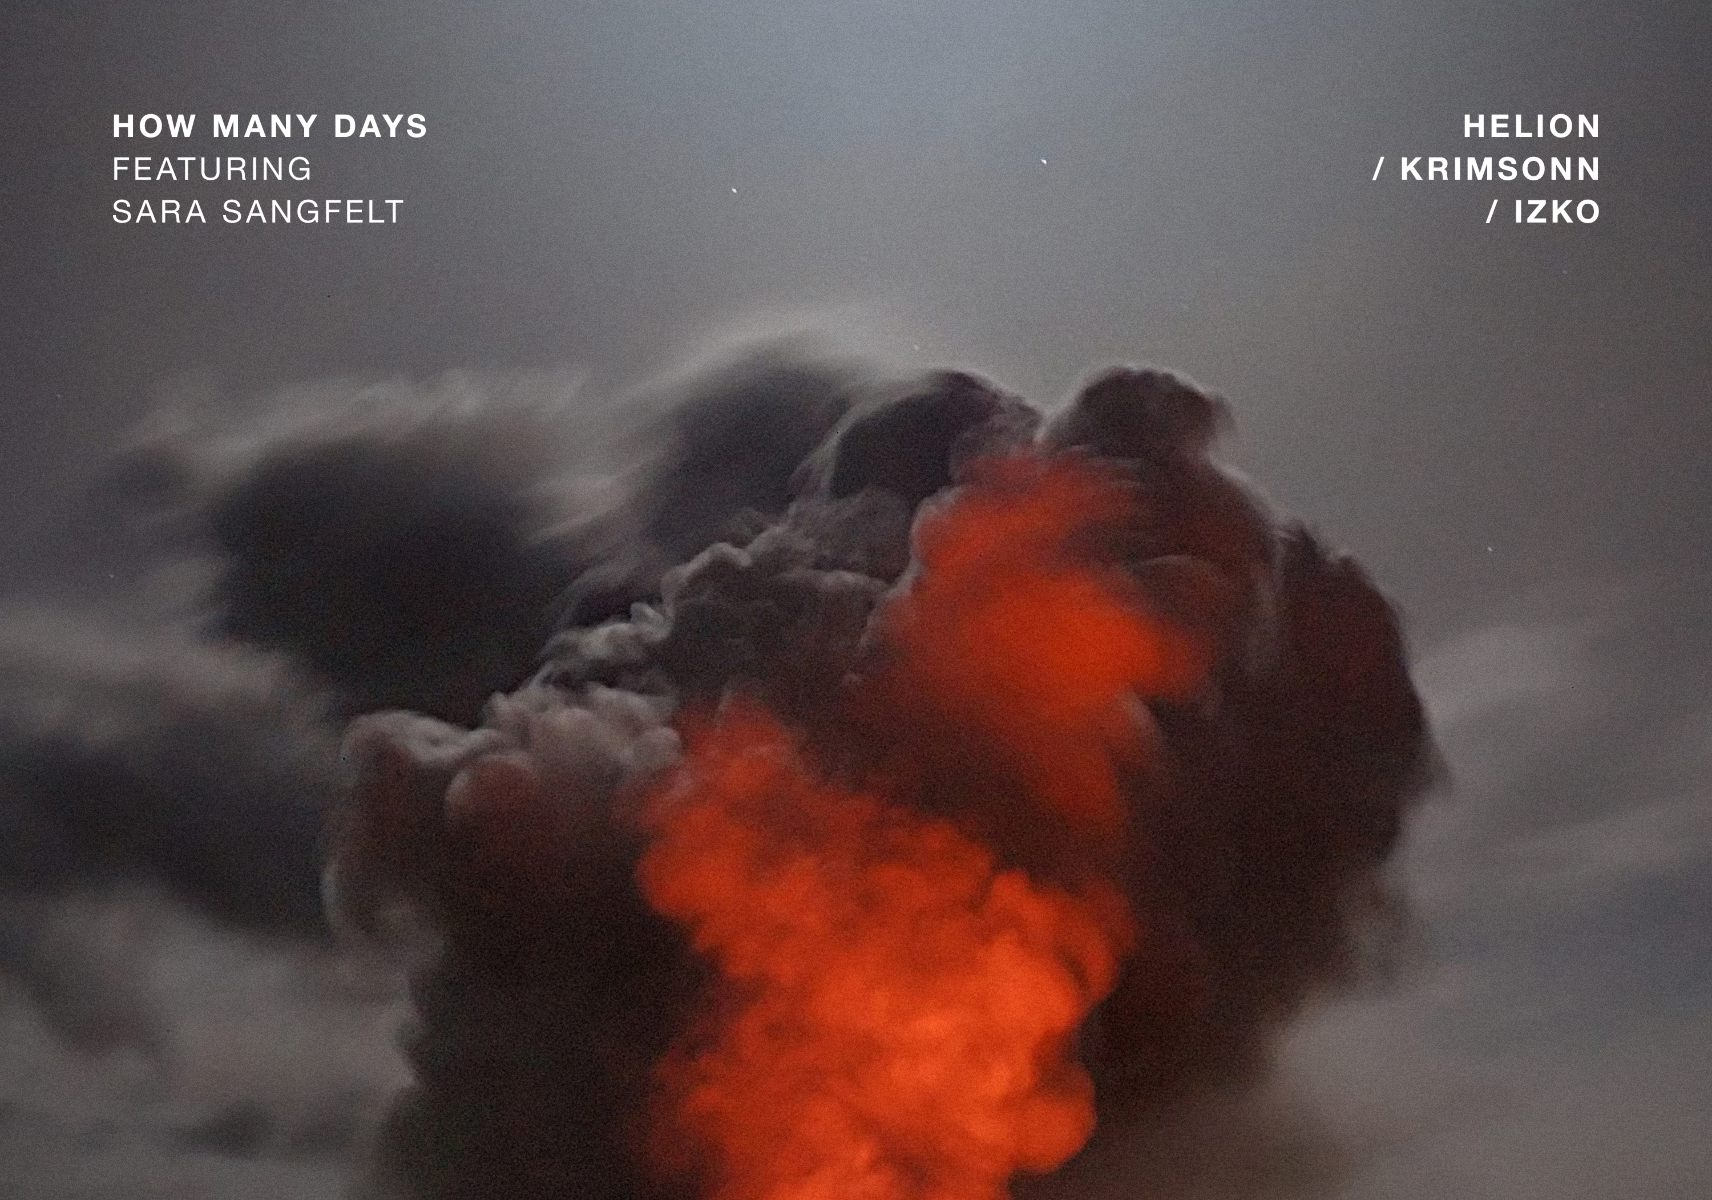 Helion, Krimsonn, Izko – How Many Days (feat. Sara Sangfelt) (1)